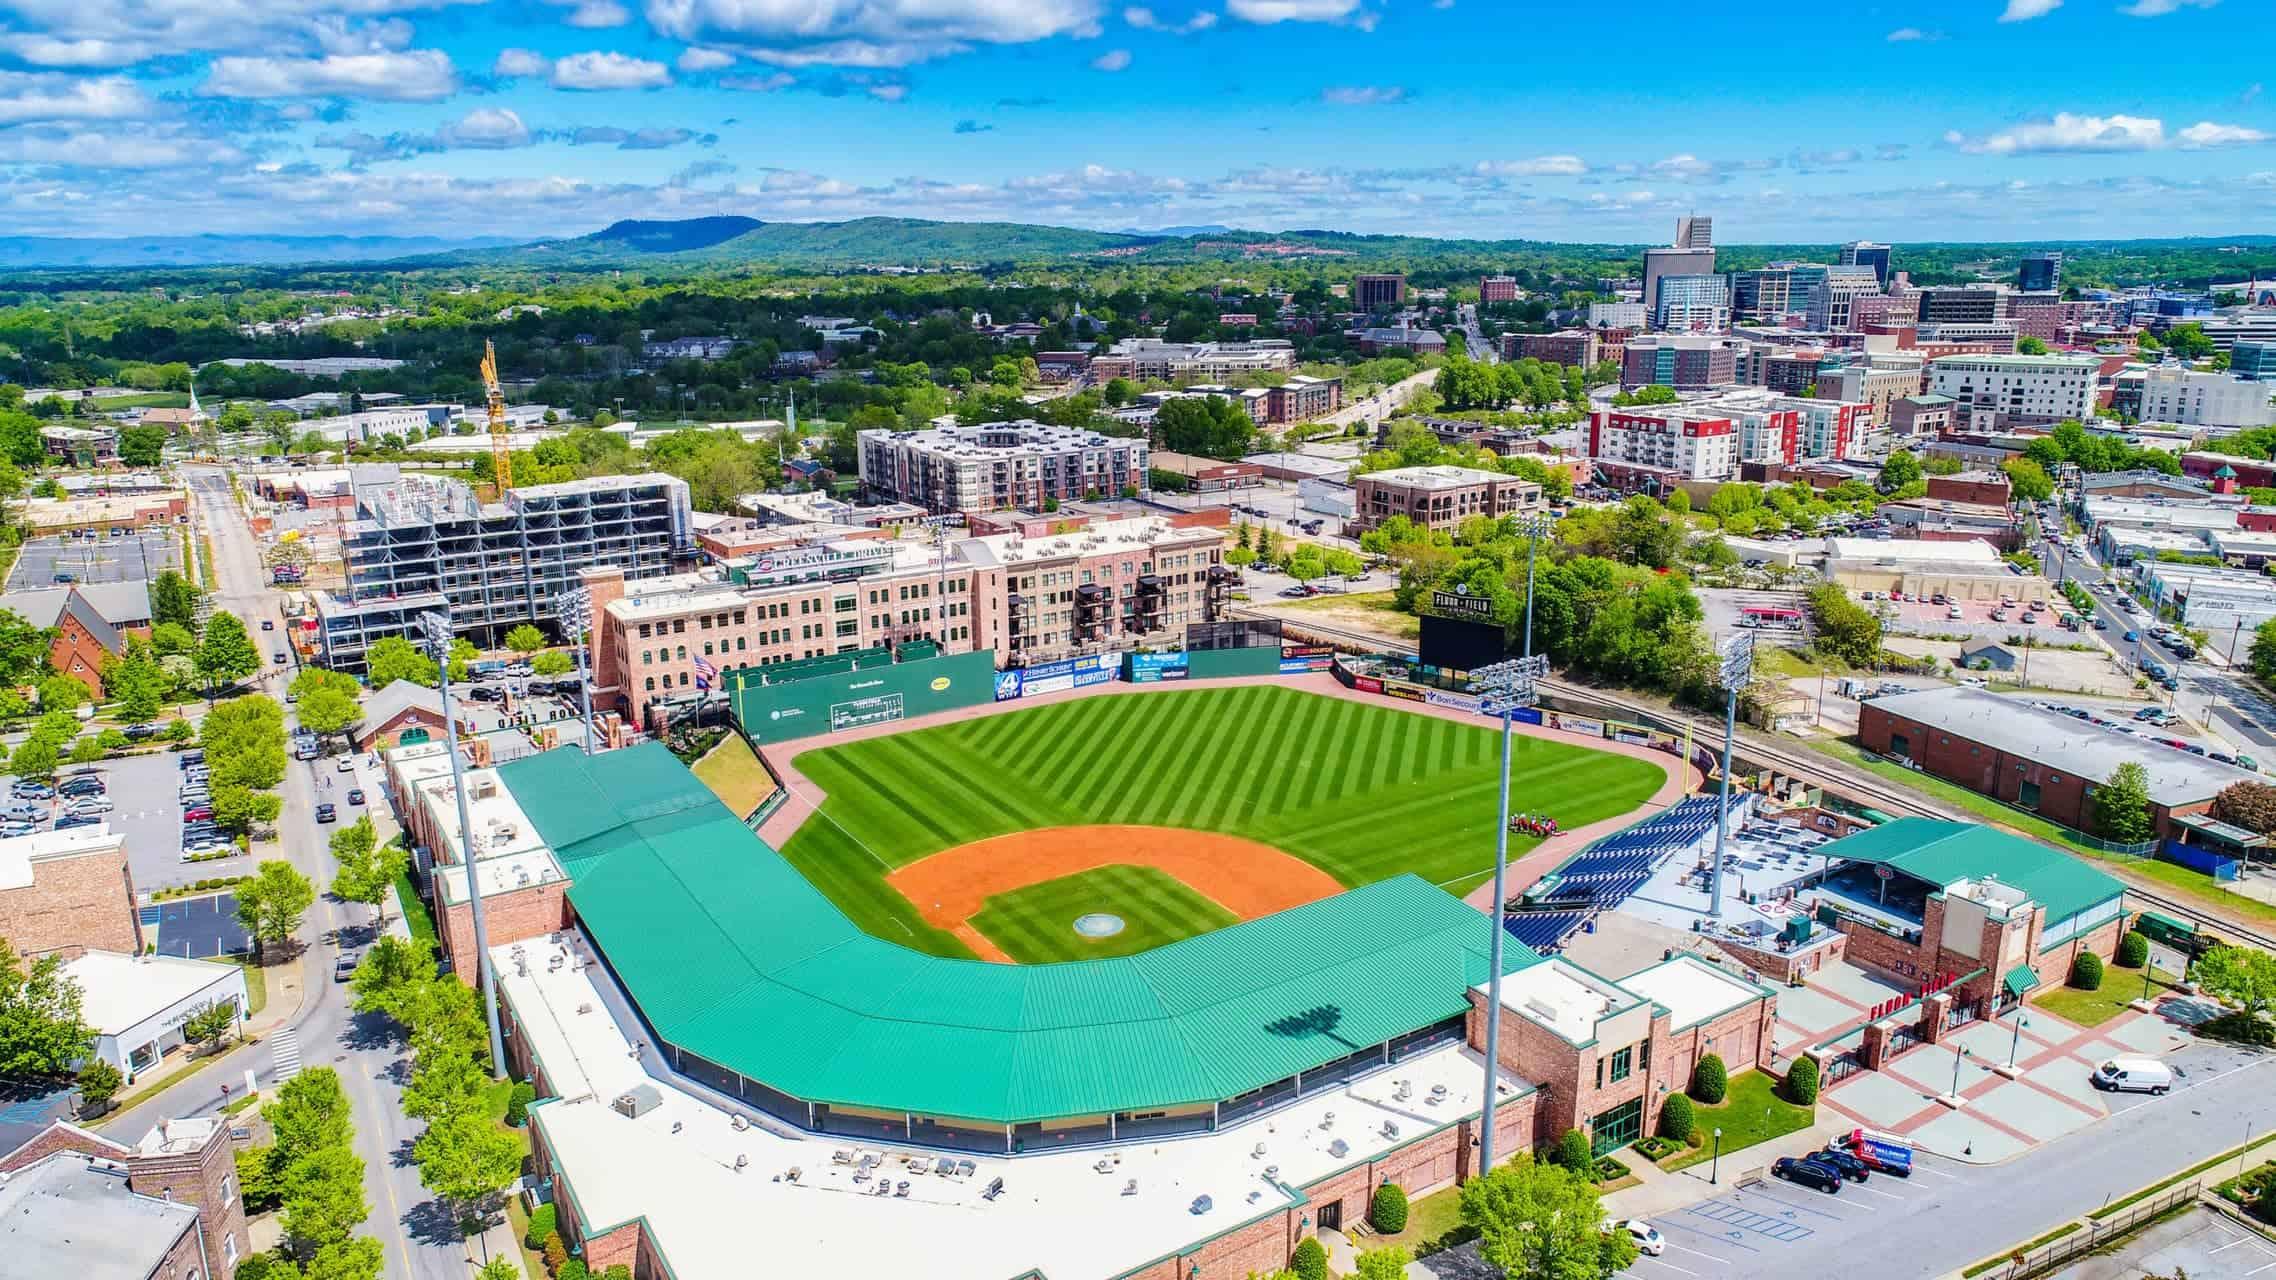 aerial shot of baseball field in greenville